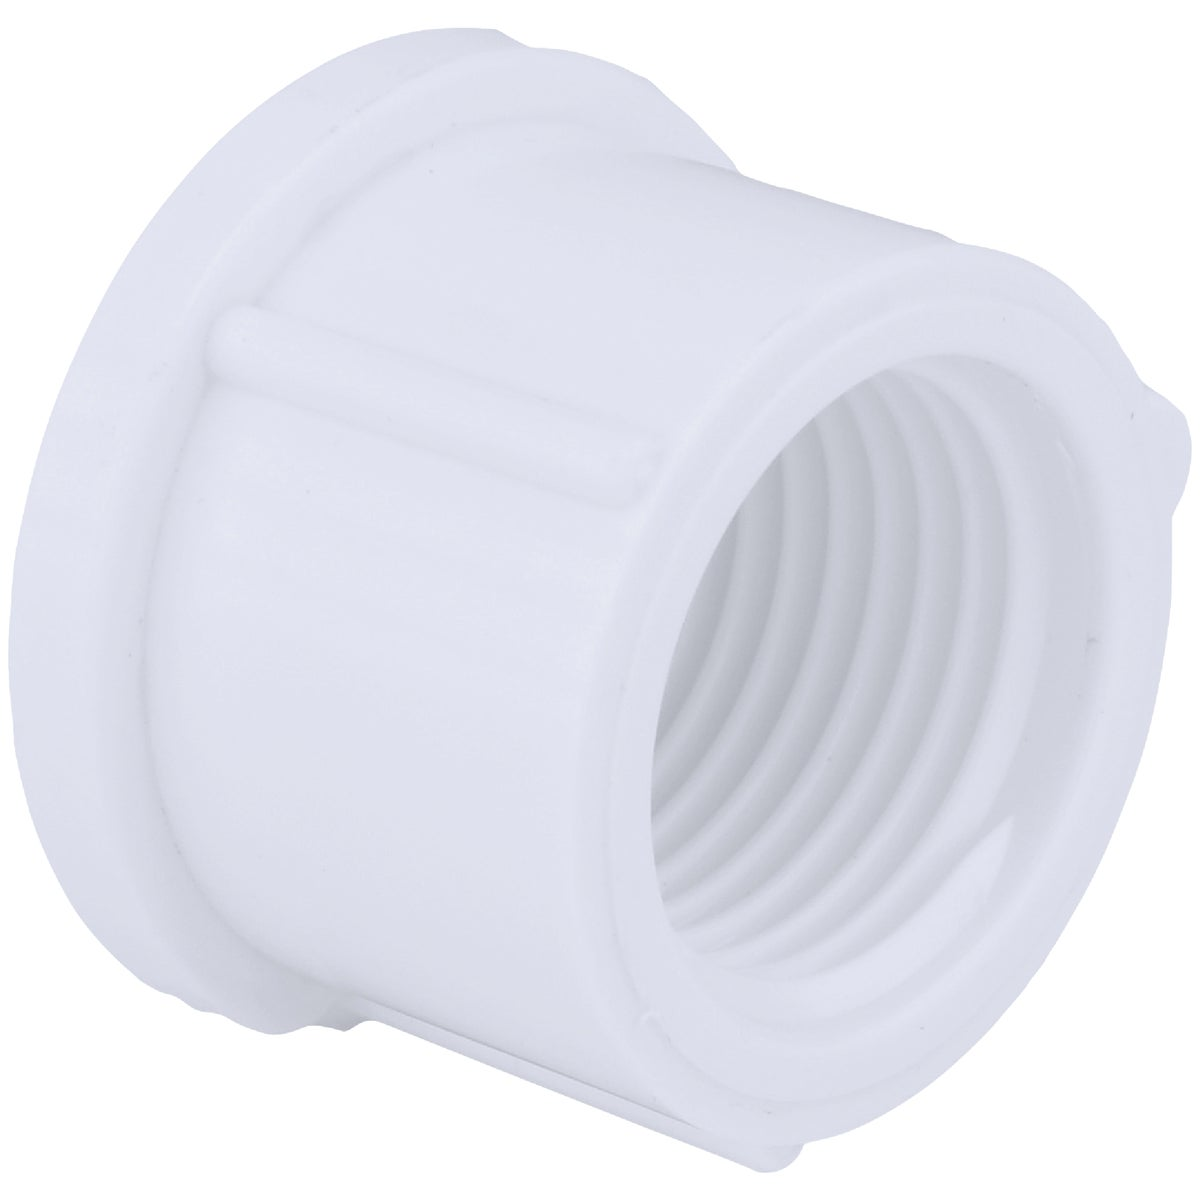 "1/2"" PVC SCH40 FIP CAP - 30165 by Genova Inc"